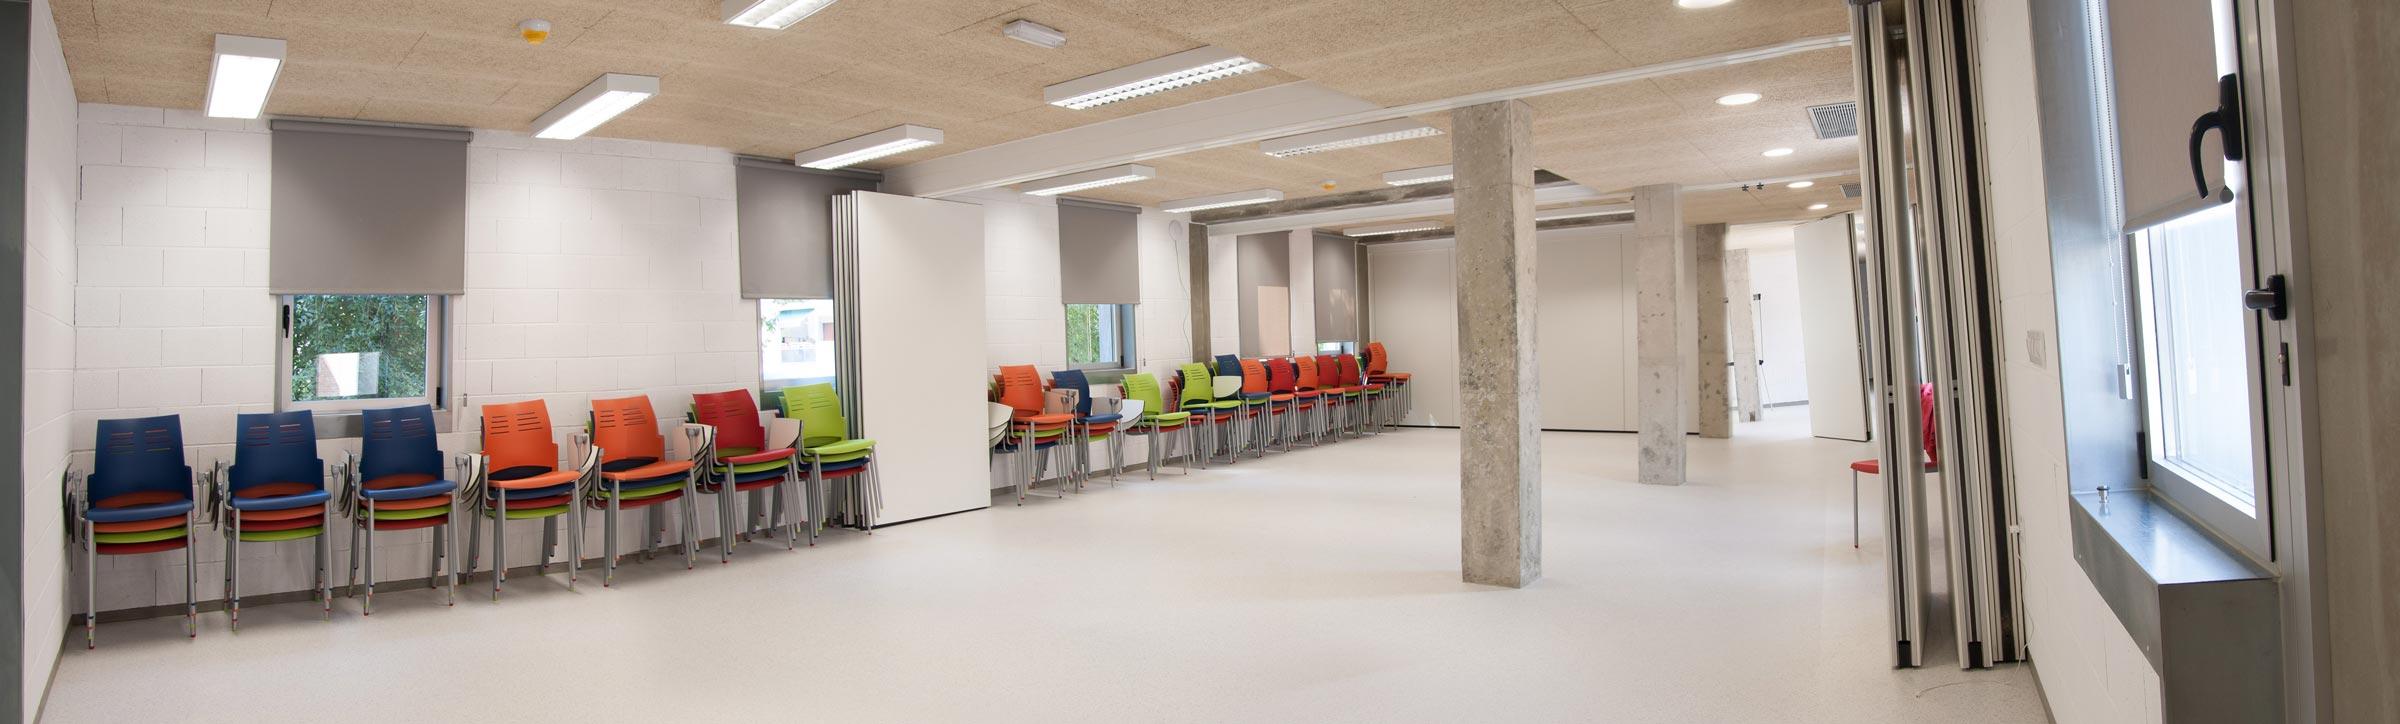 Sala panelable Scout Madrid Hostel - 2